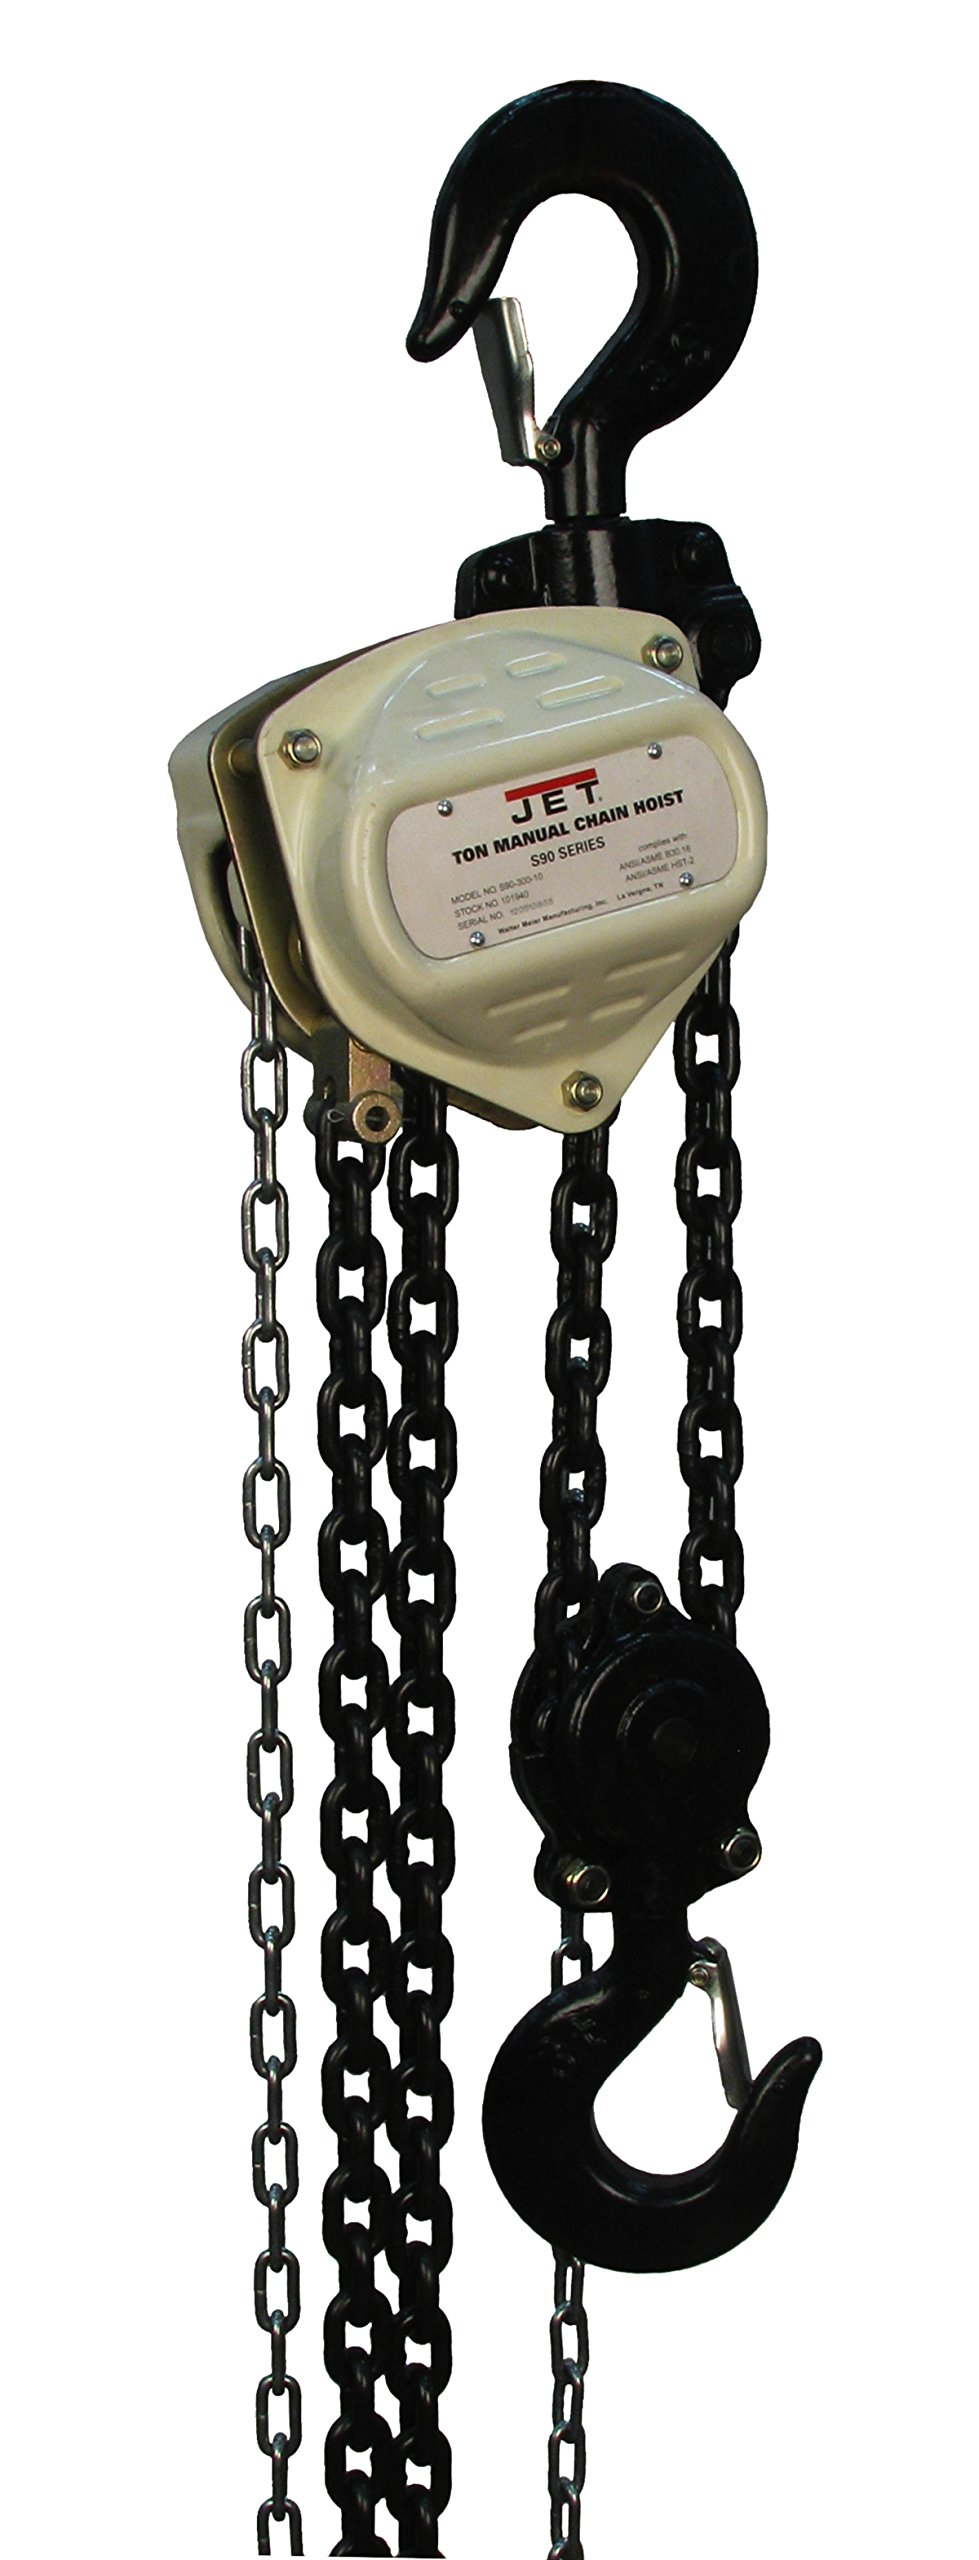 Jet S90-500-20 S90 Series Hand Chain Hoists